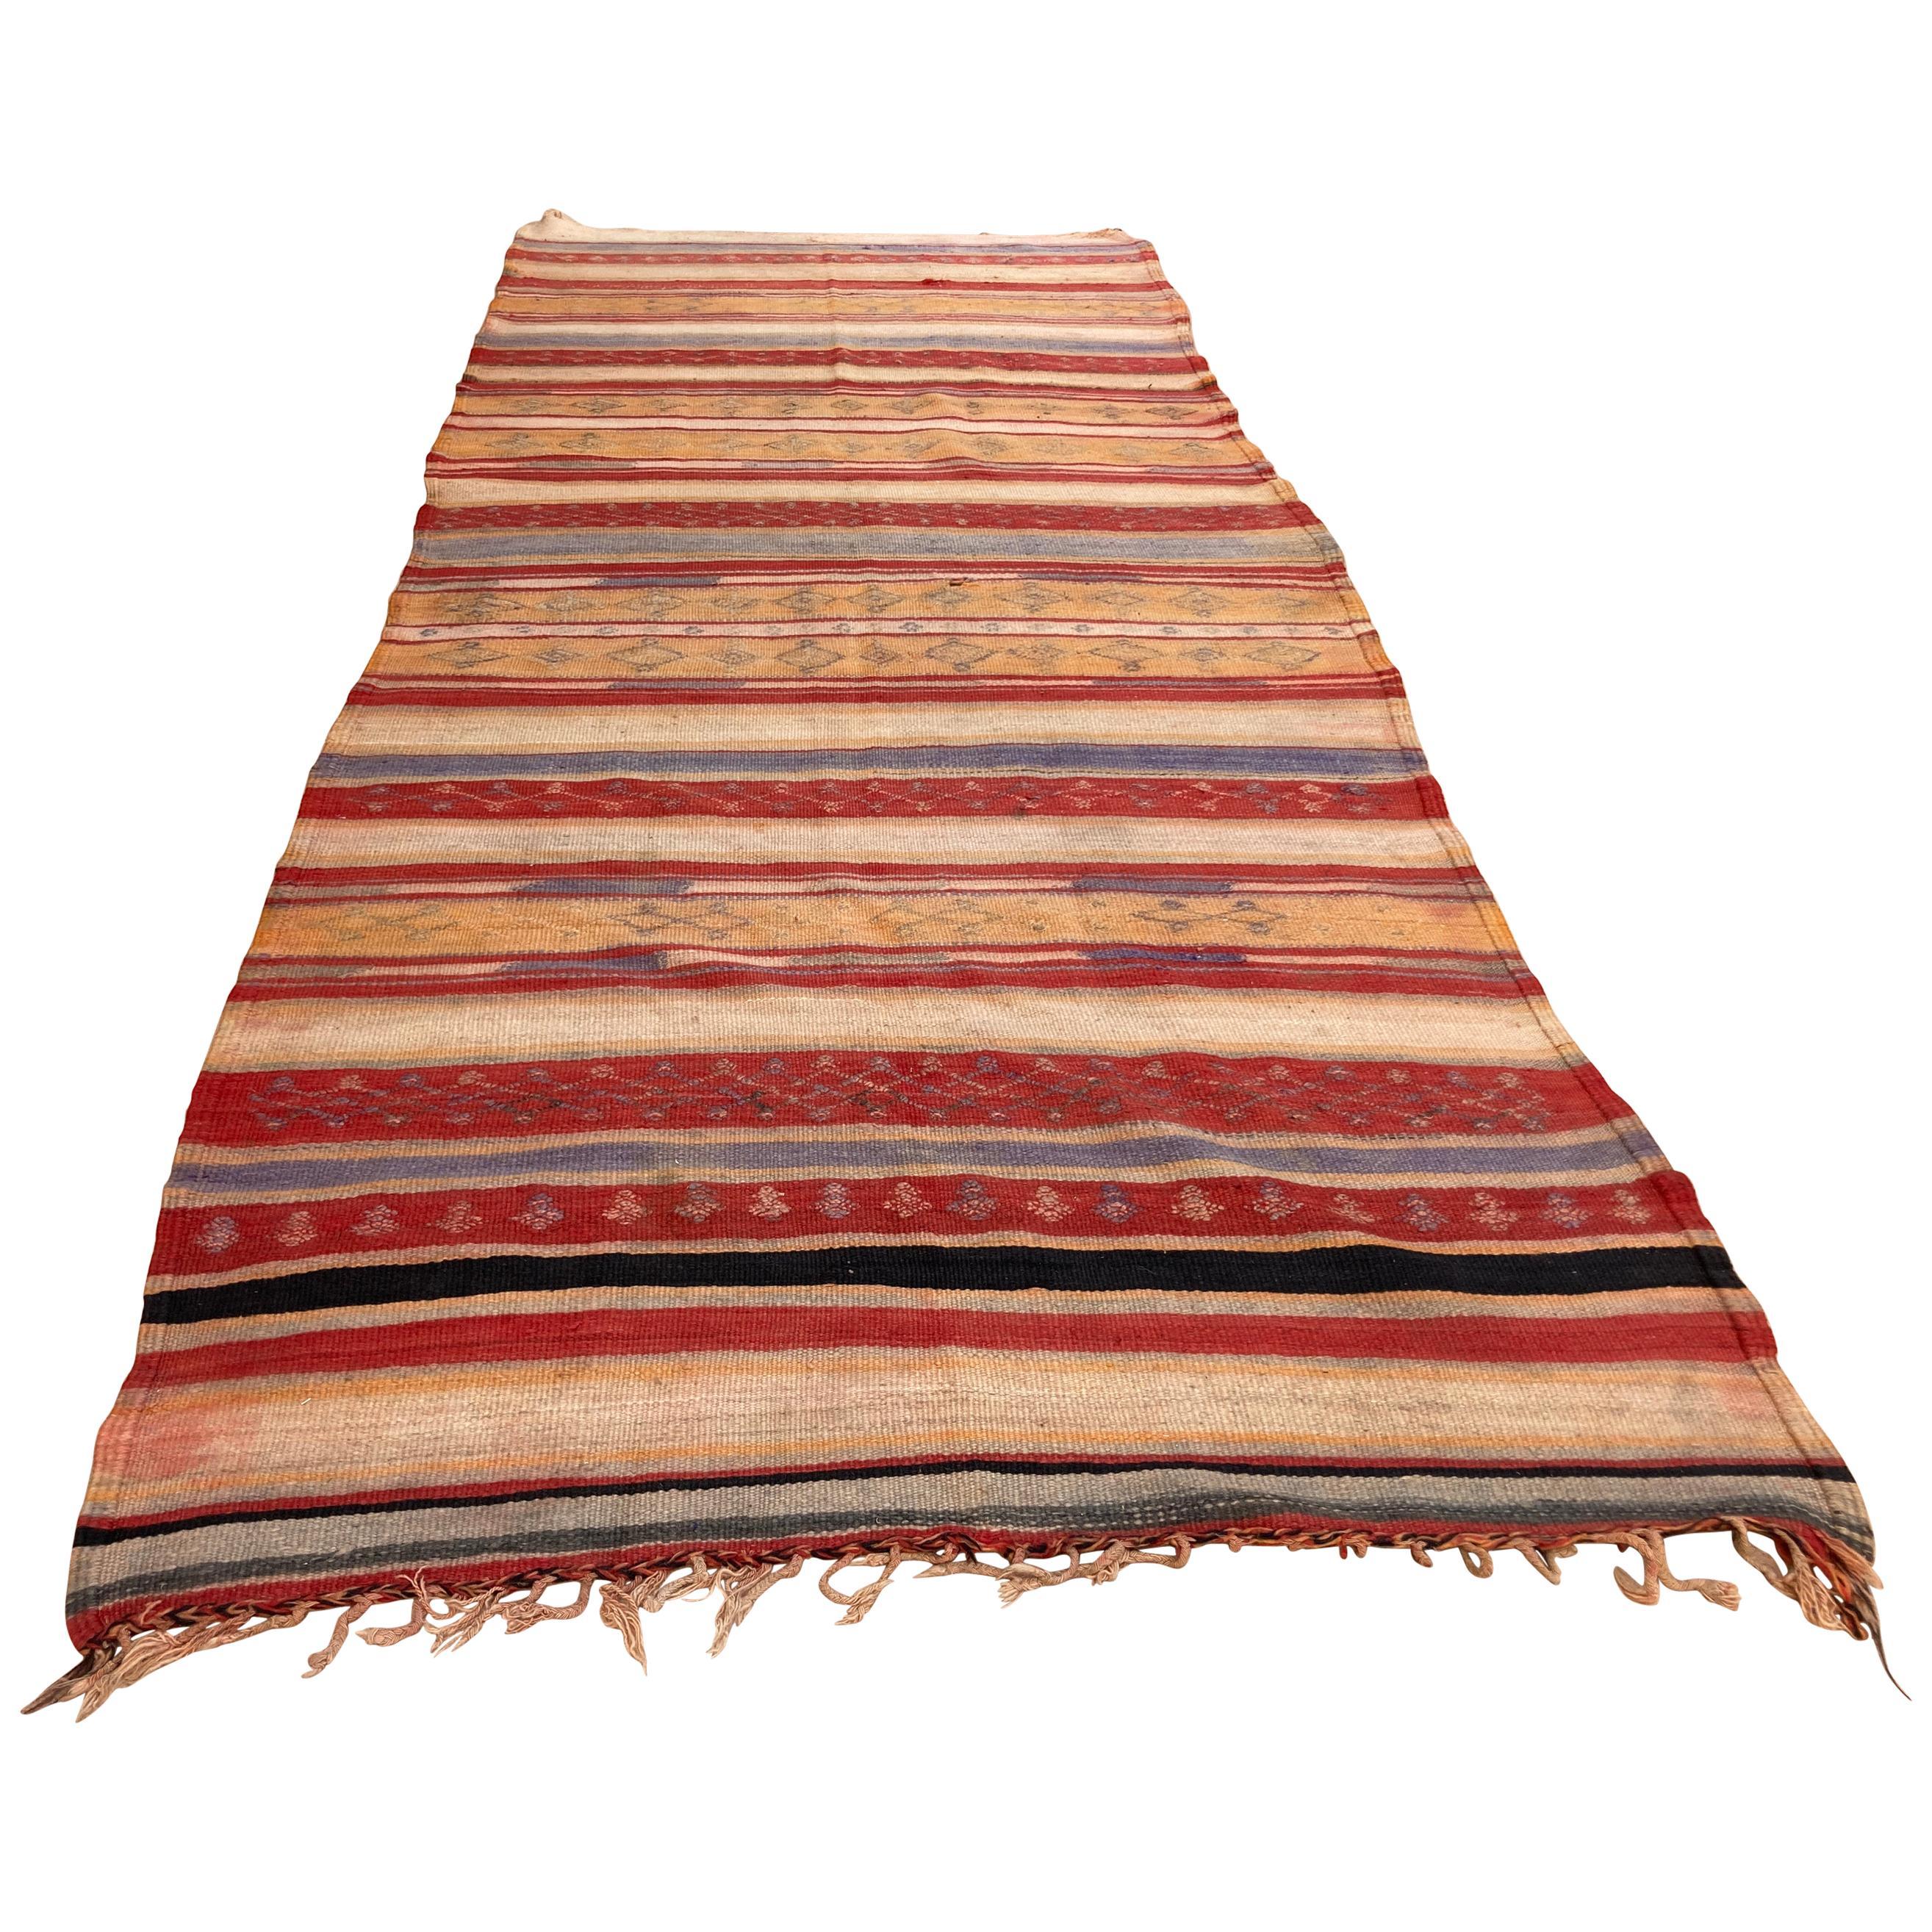 Vintage Moroccan Tribal Kilim Rug, circa 1960